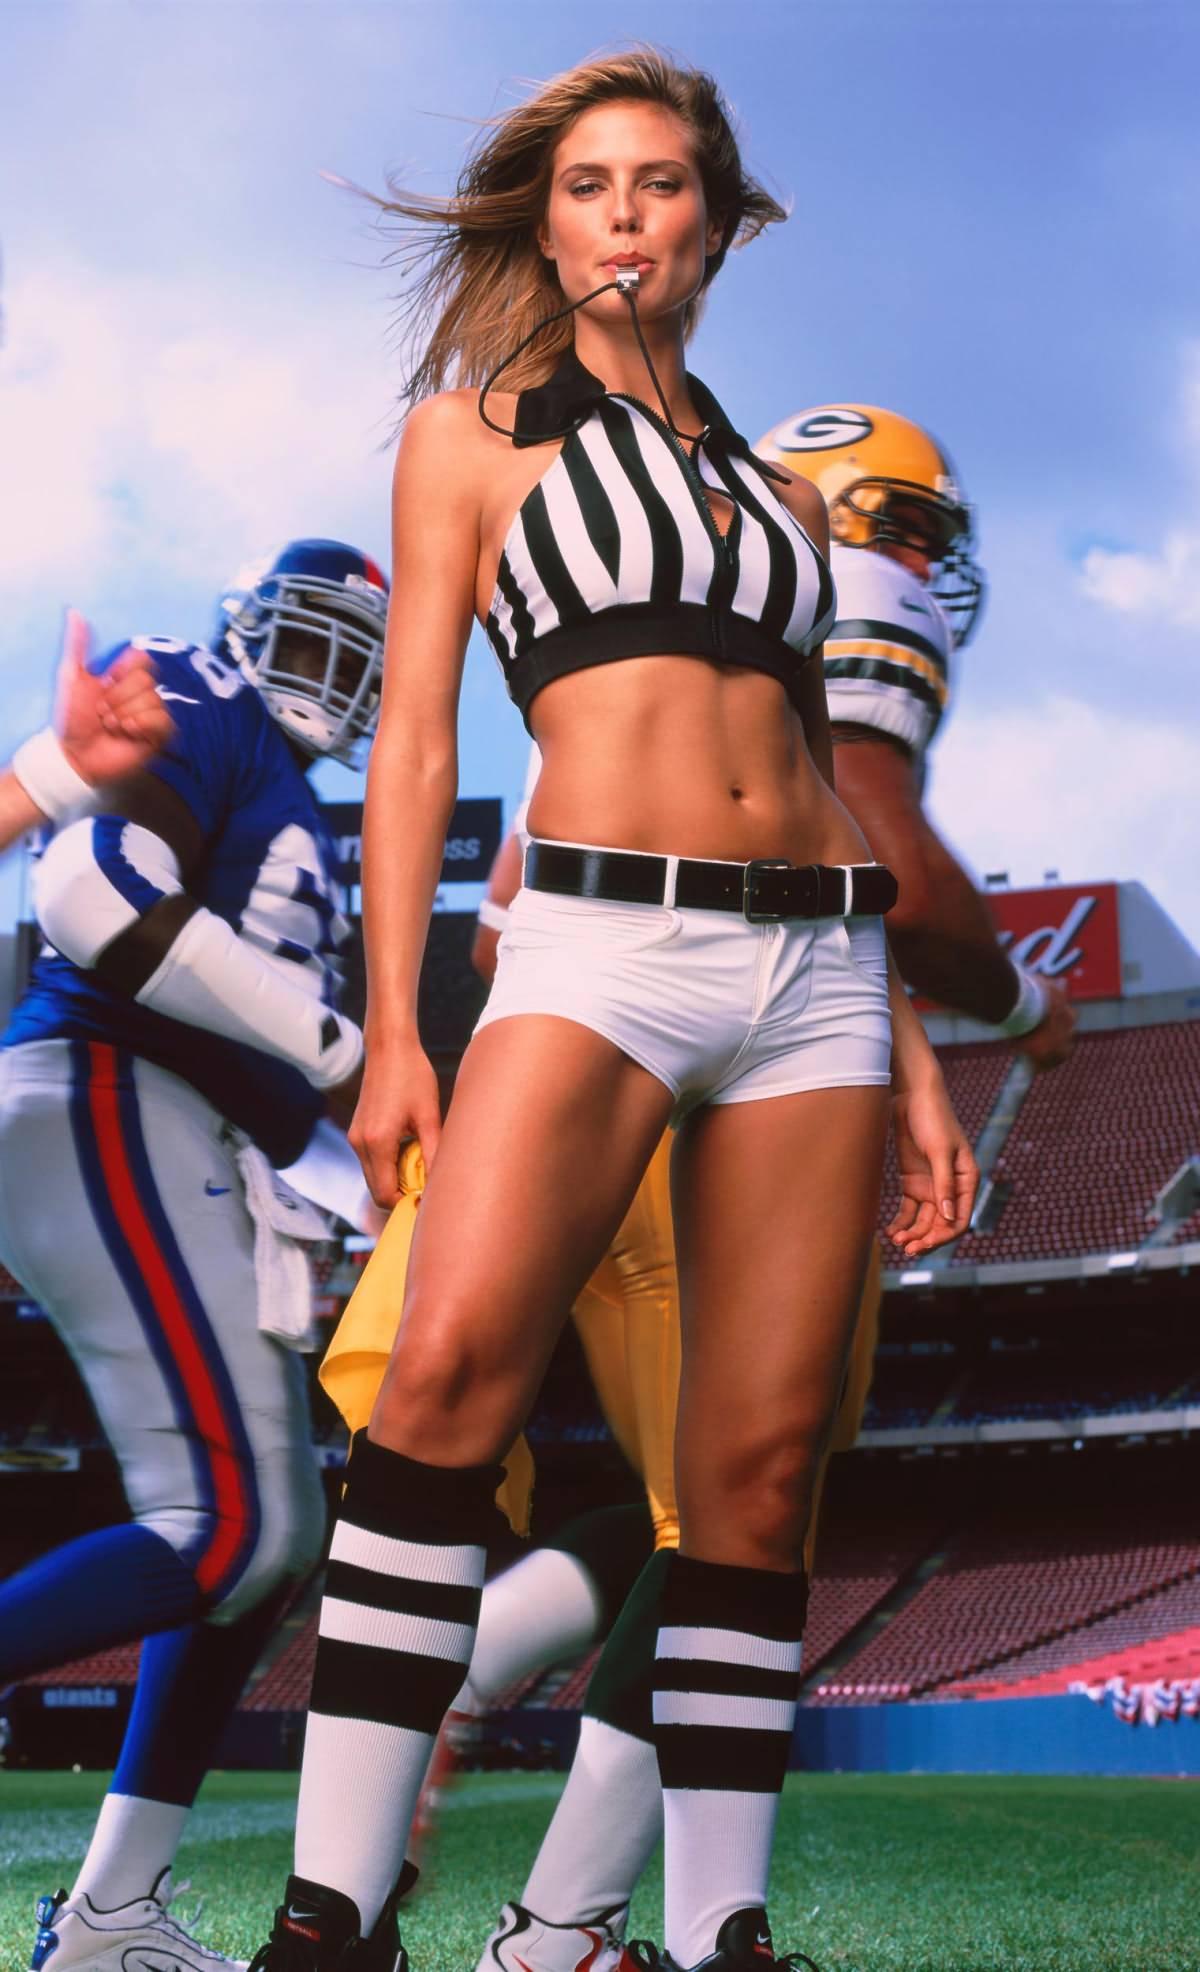 Heidi Klum hot pic